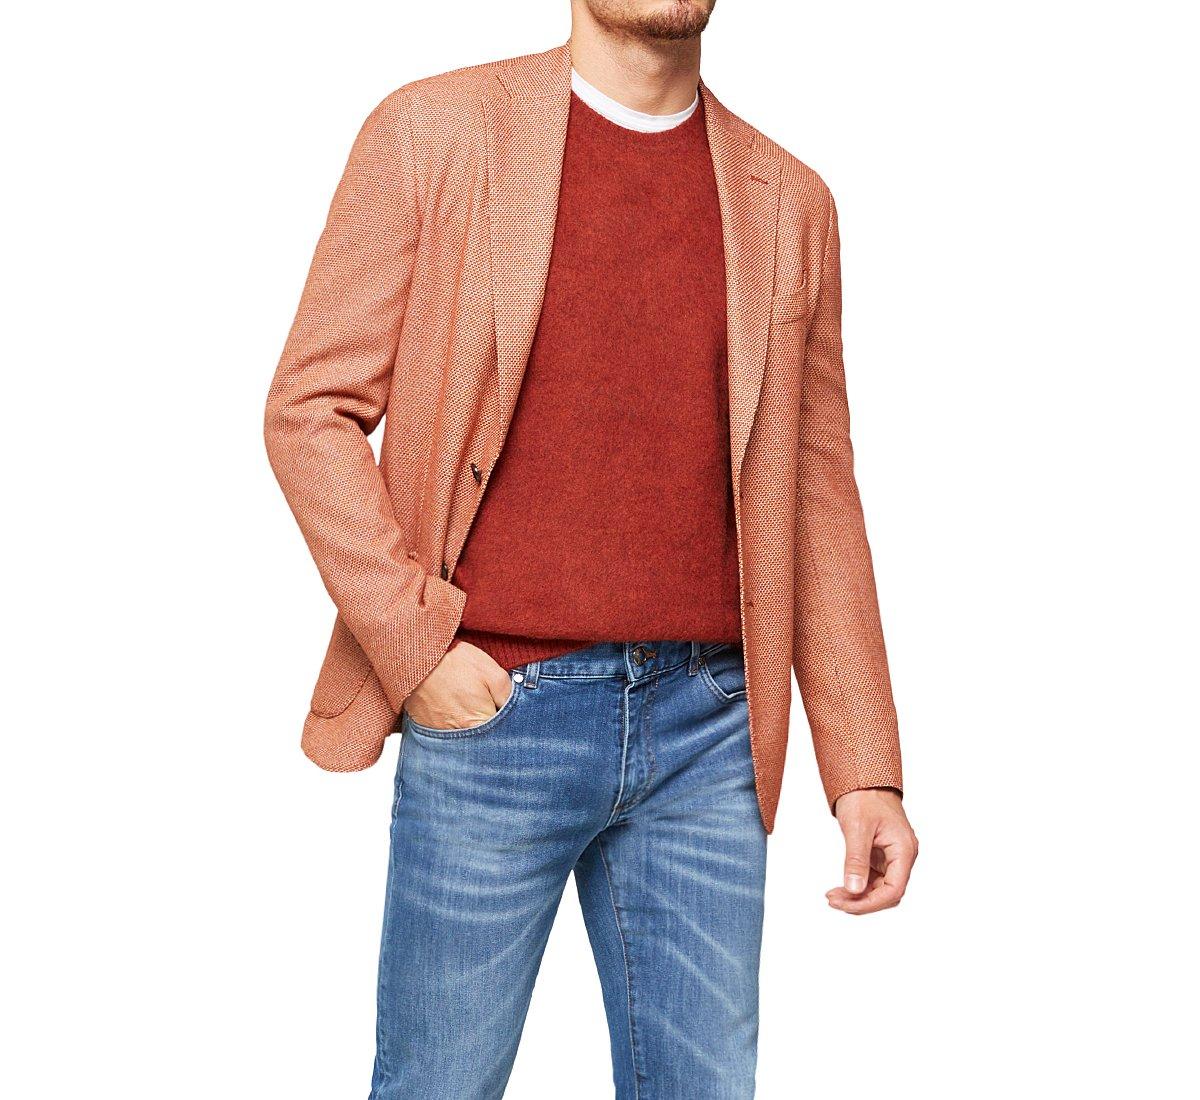 Blazer with lapel collar